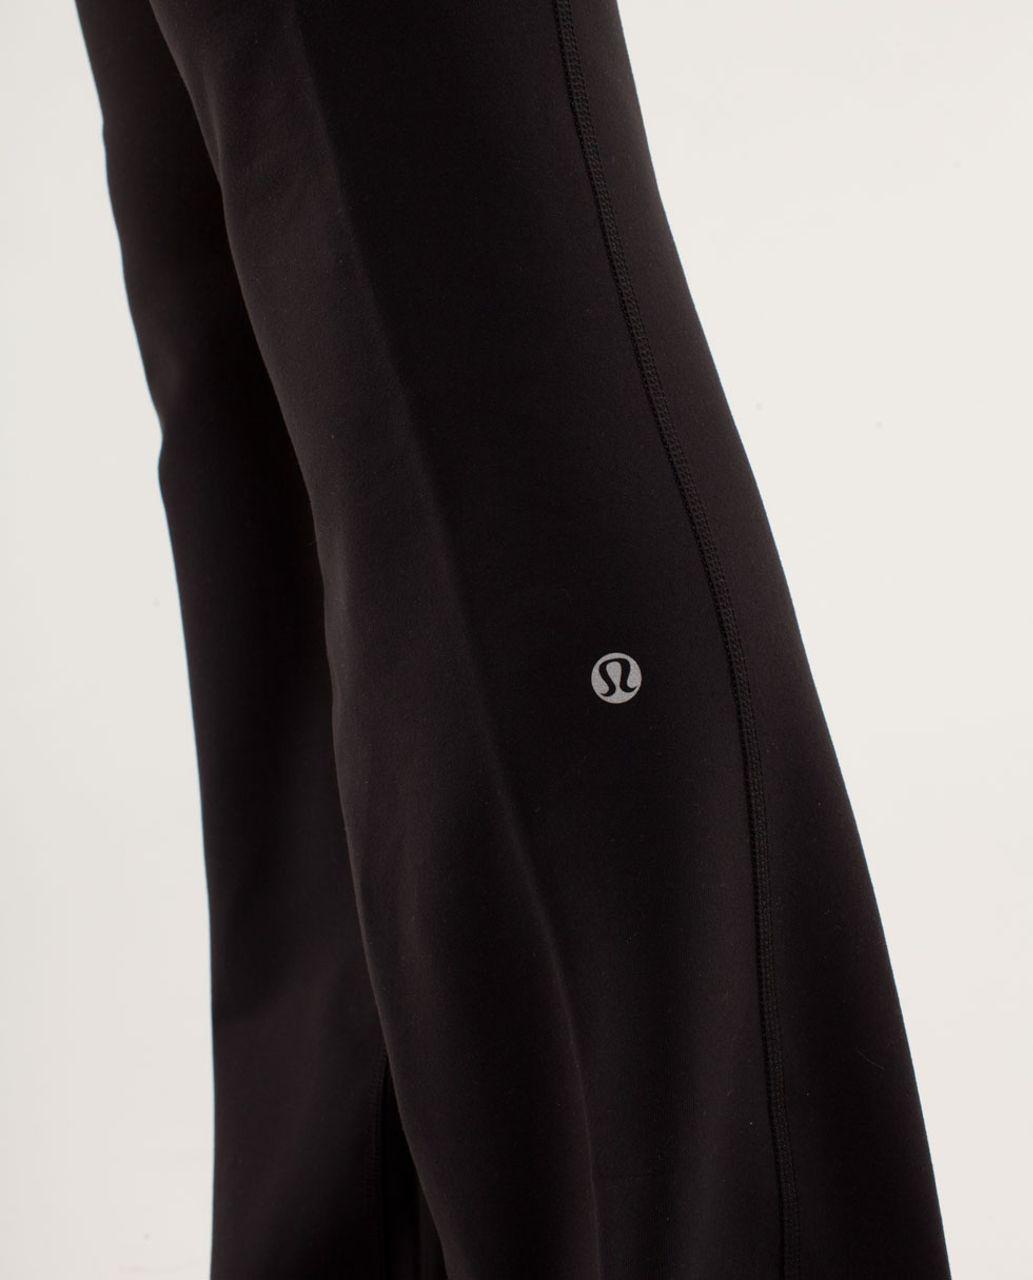 Lululemon Groove Pant *Slim (Regular) - Black /  Quilting Winter 12